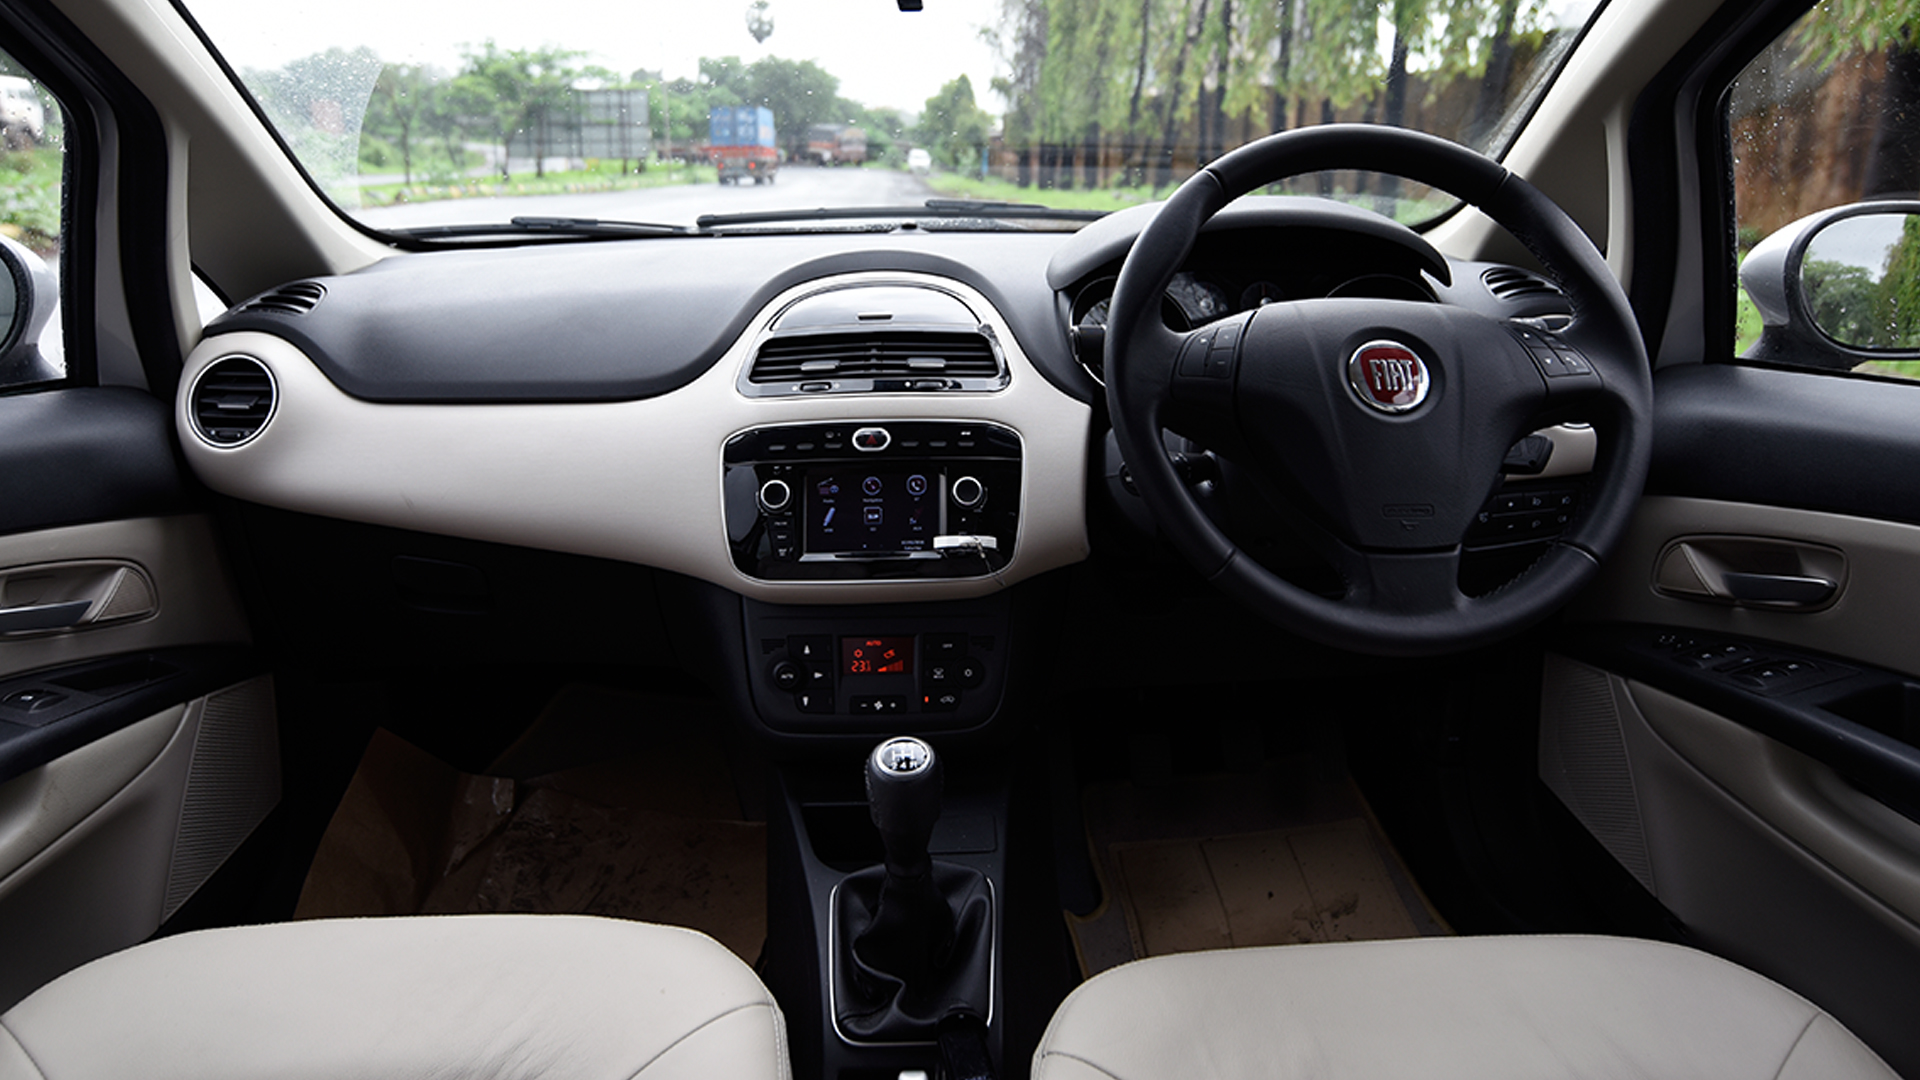 Fiat Linea 125 s 2016 T Jet Emotion Compare